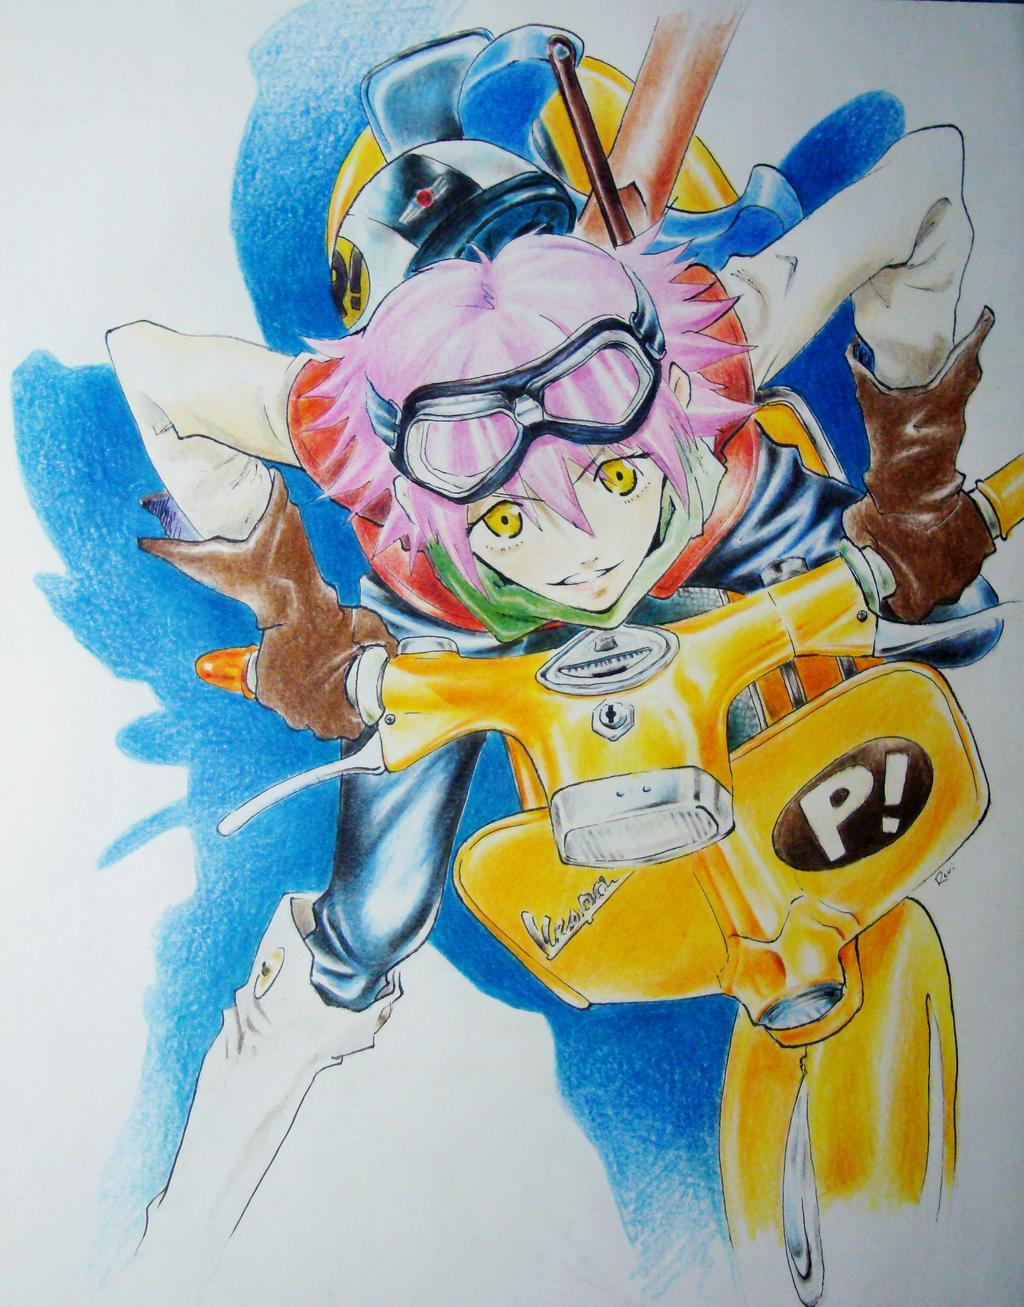 Haruko by itoko-sempai